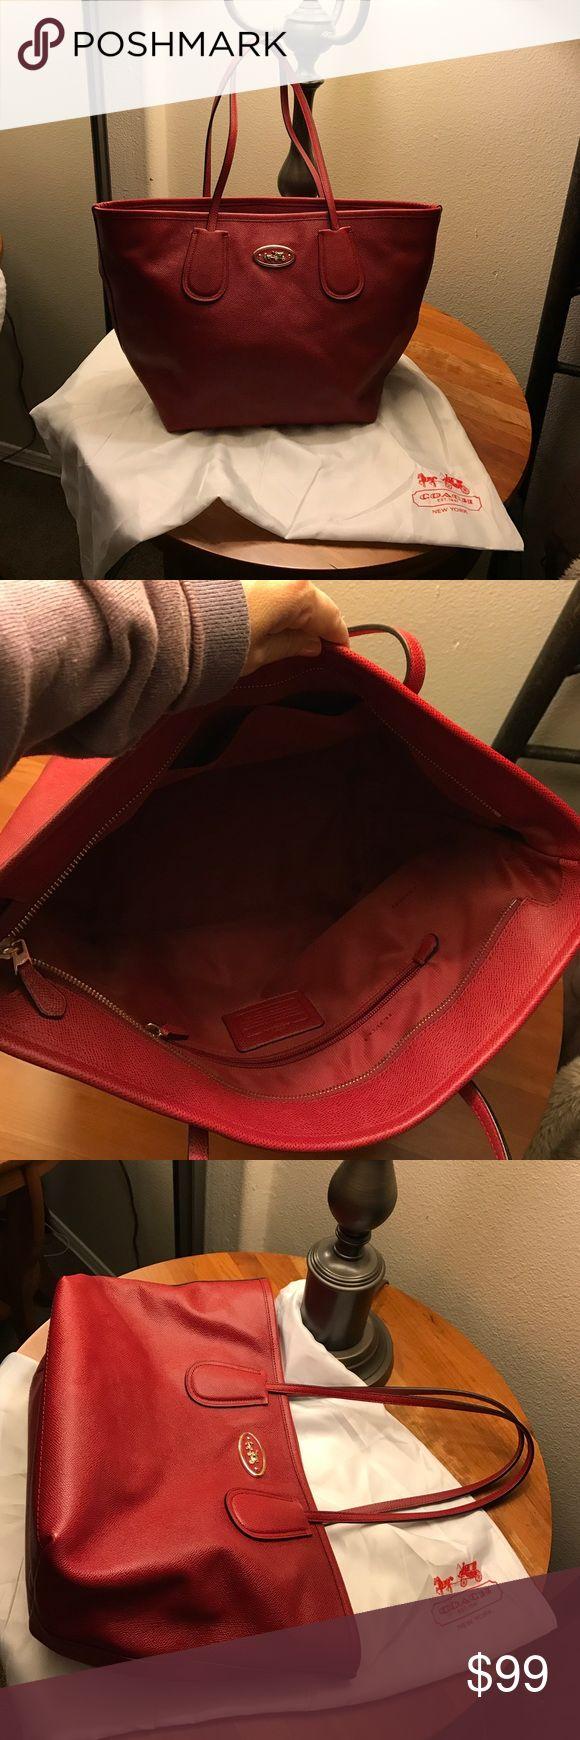 Coach purse Red beautiful hobo coach purse super clean coach Bags Hobos